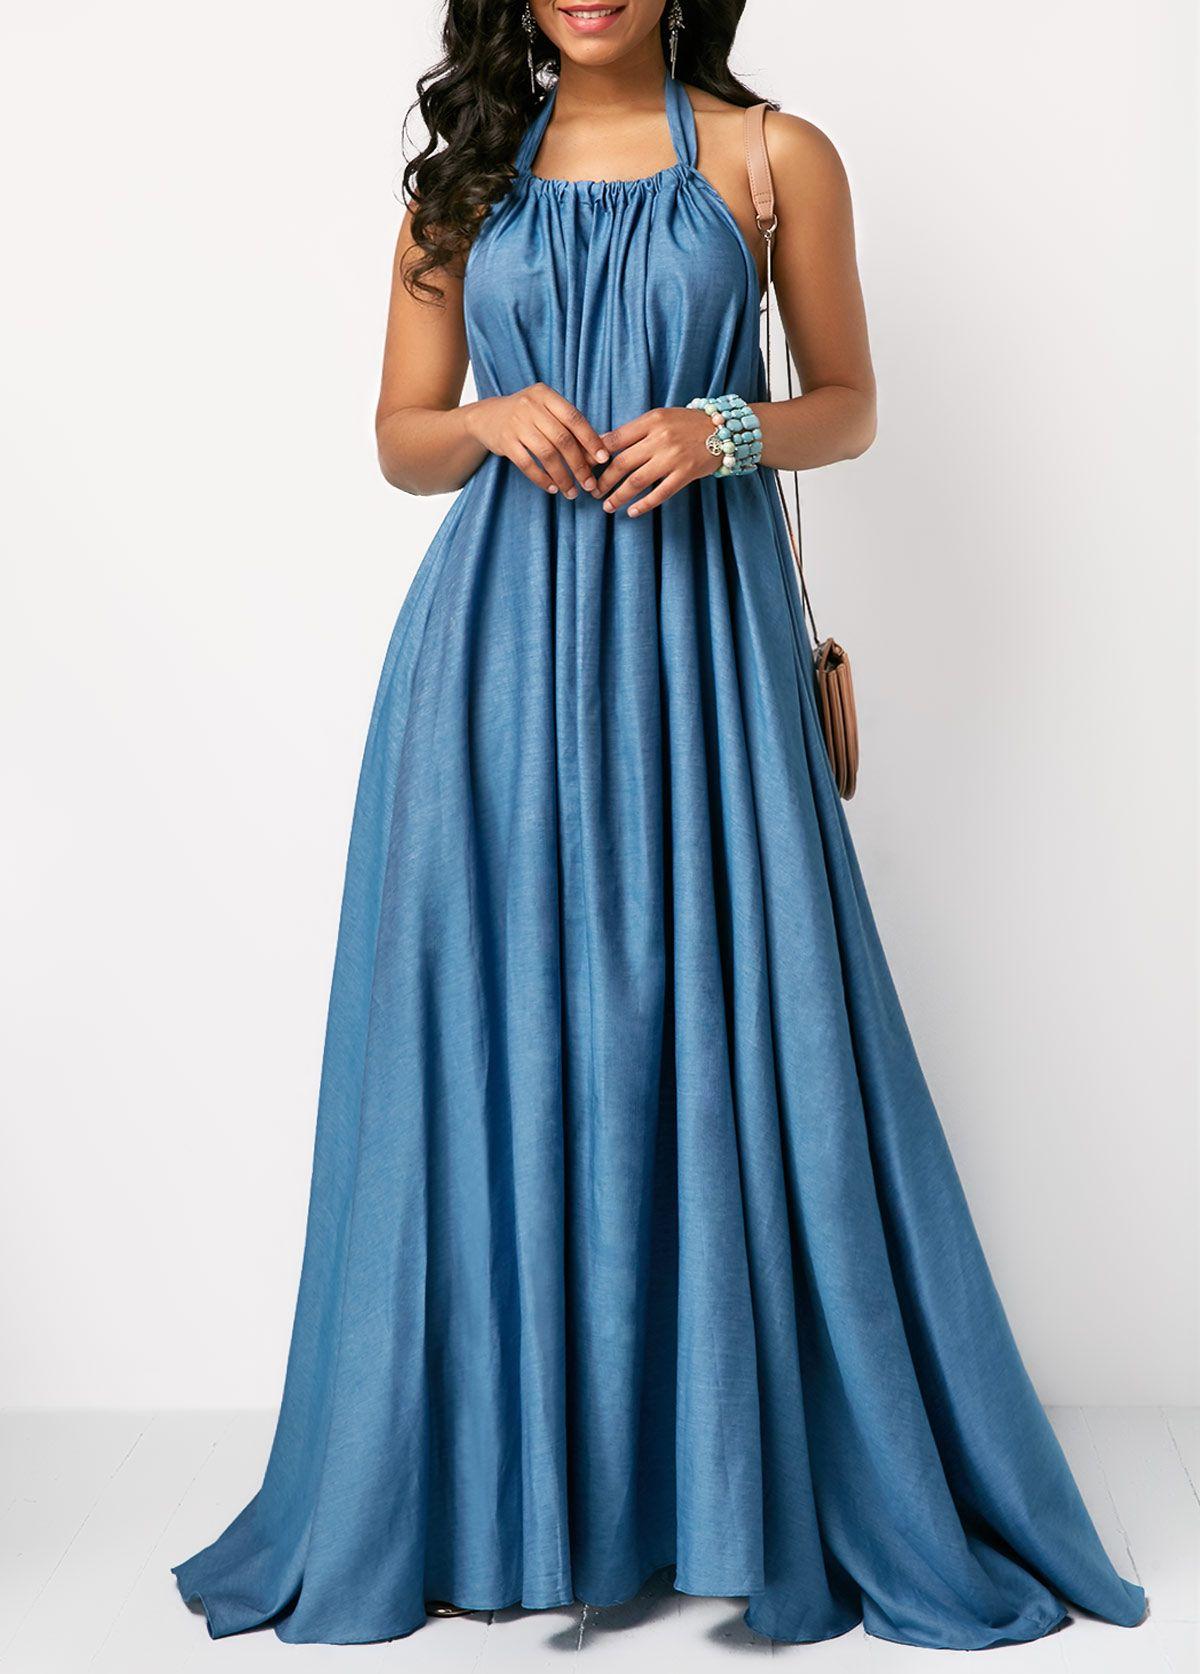 7c267830dd Solid Blue Open Back Maxi Dress   Rosewe.com - USD $36.63   clothing ...